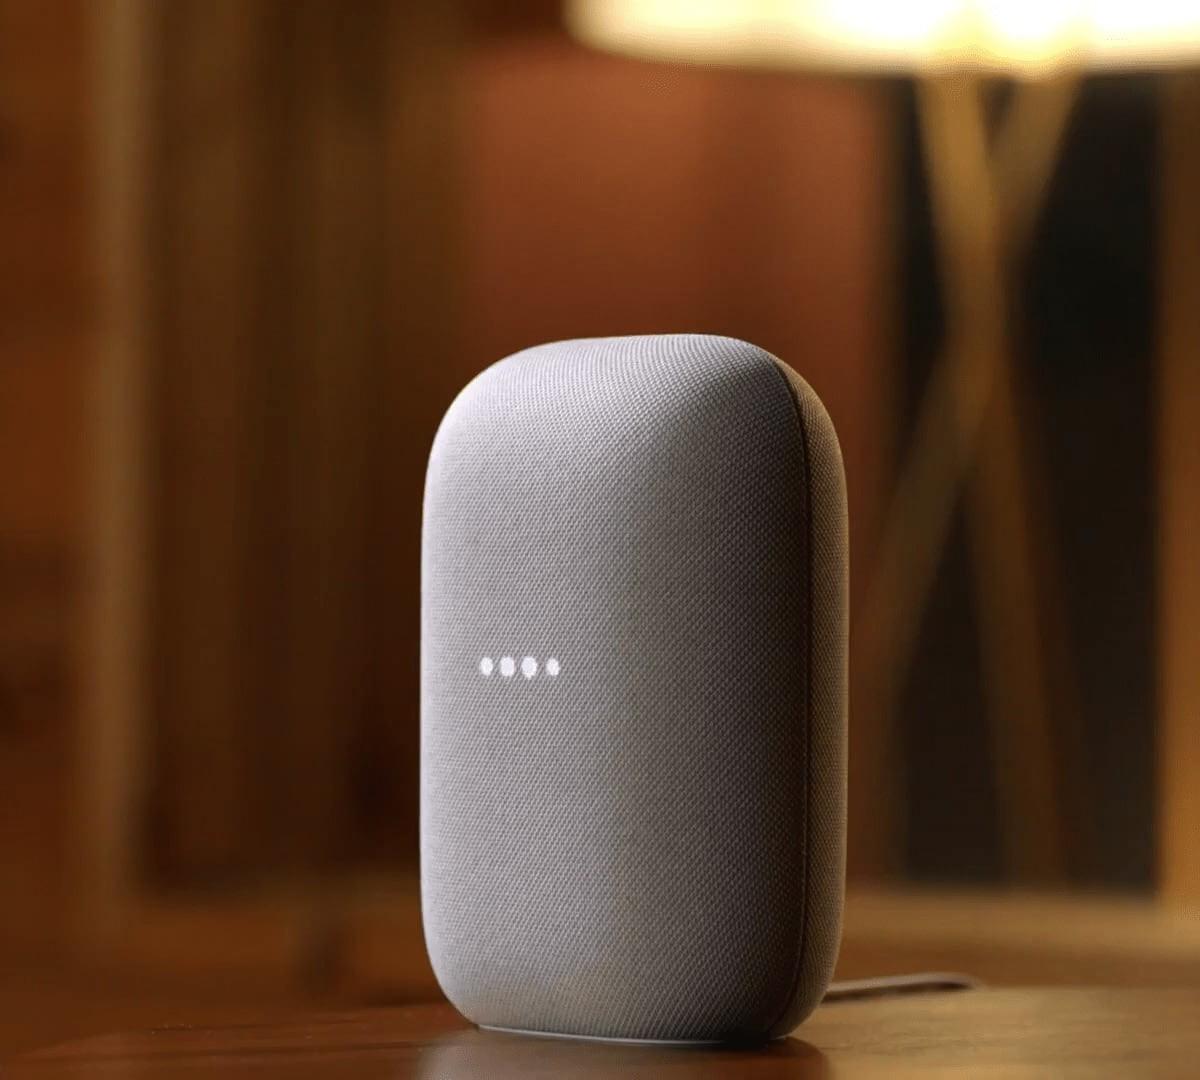 Google Nest Audio smart speaker delivers more bass and volume